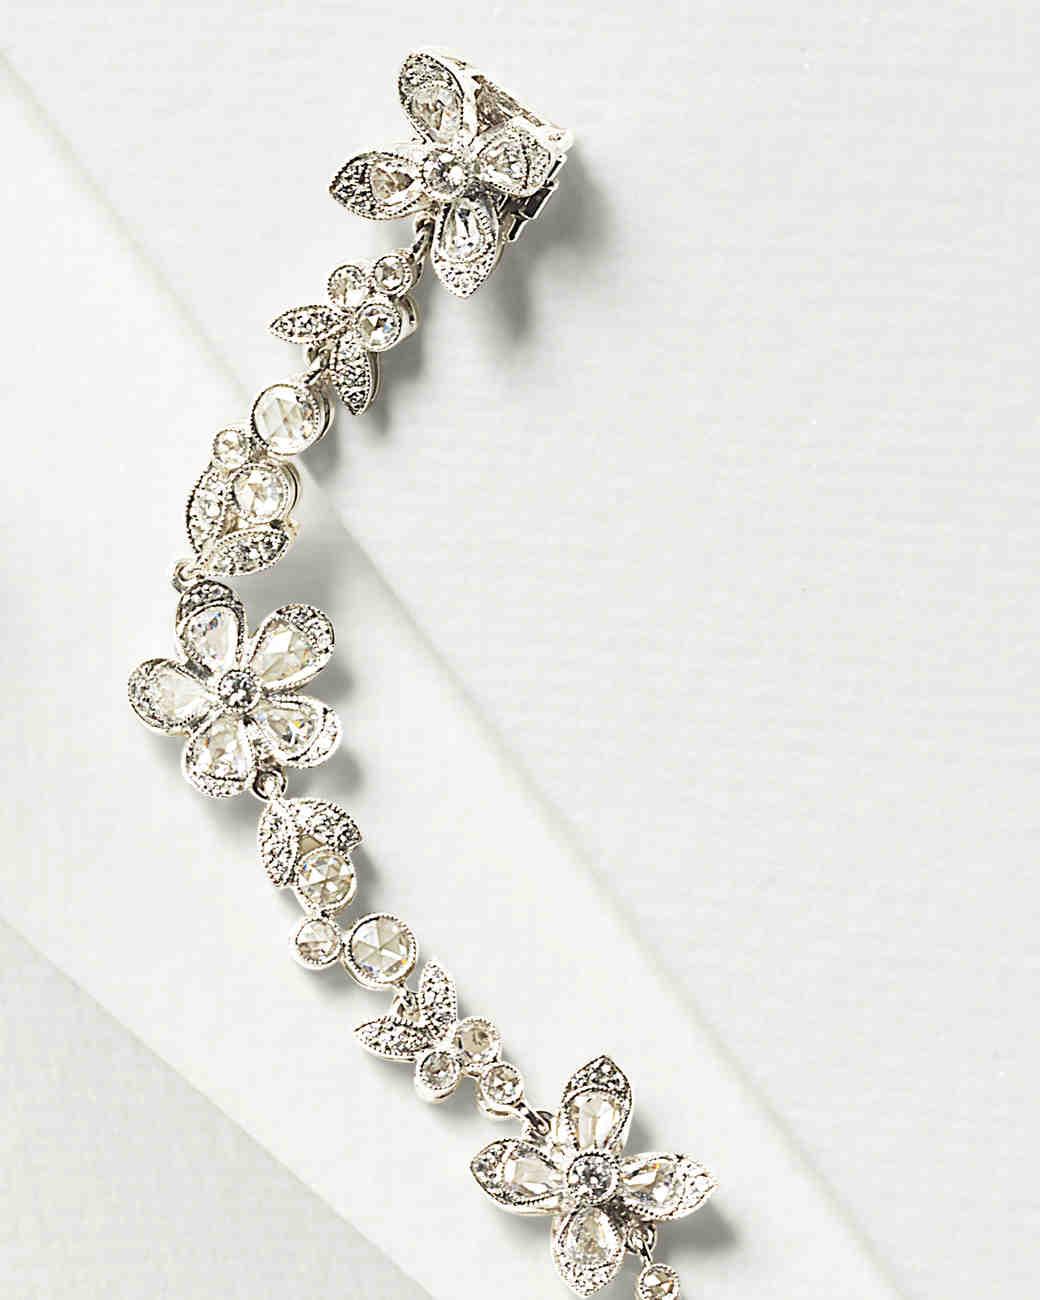 tiffany-necklace-mwd110049.jpg